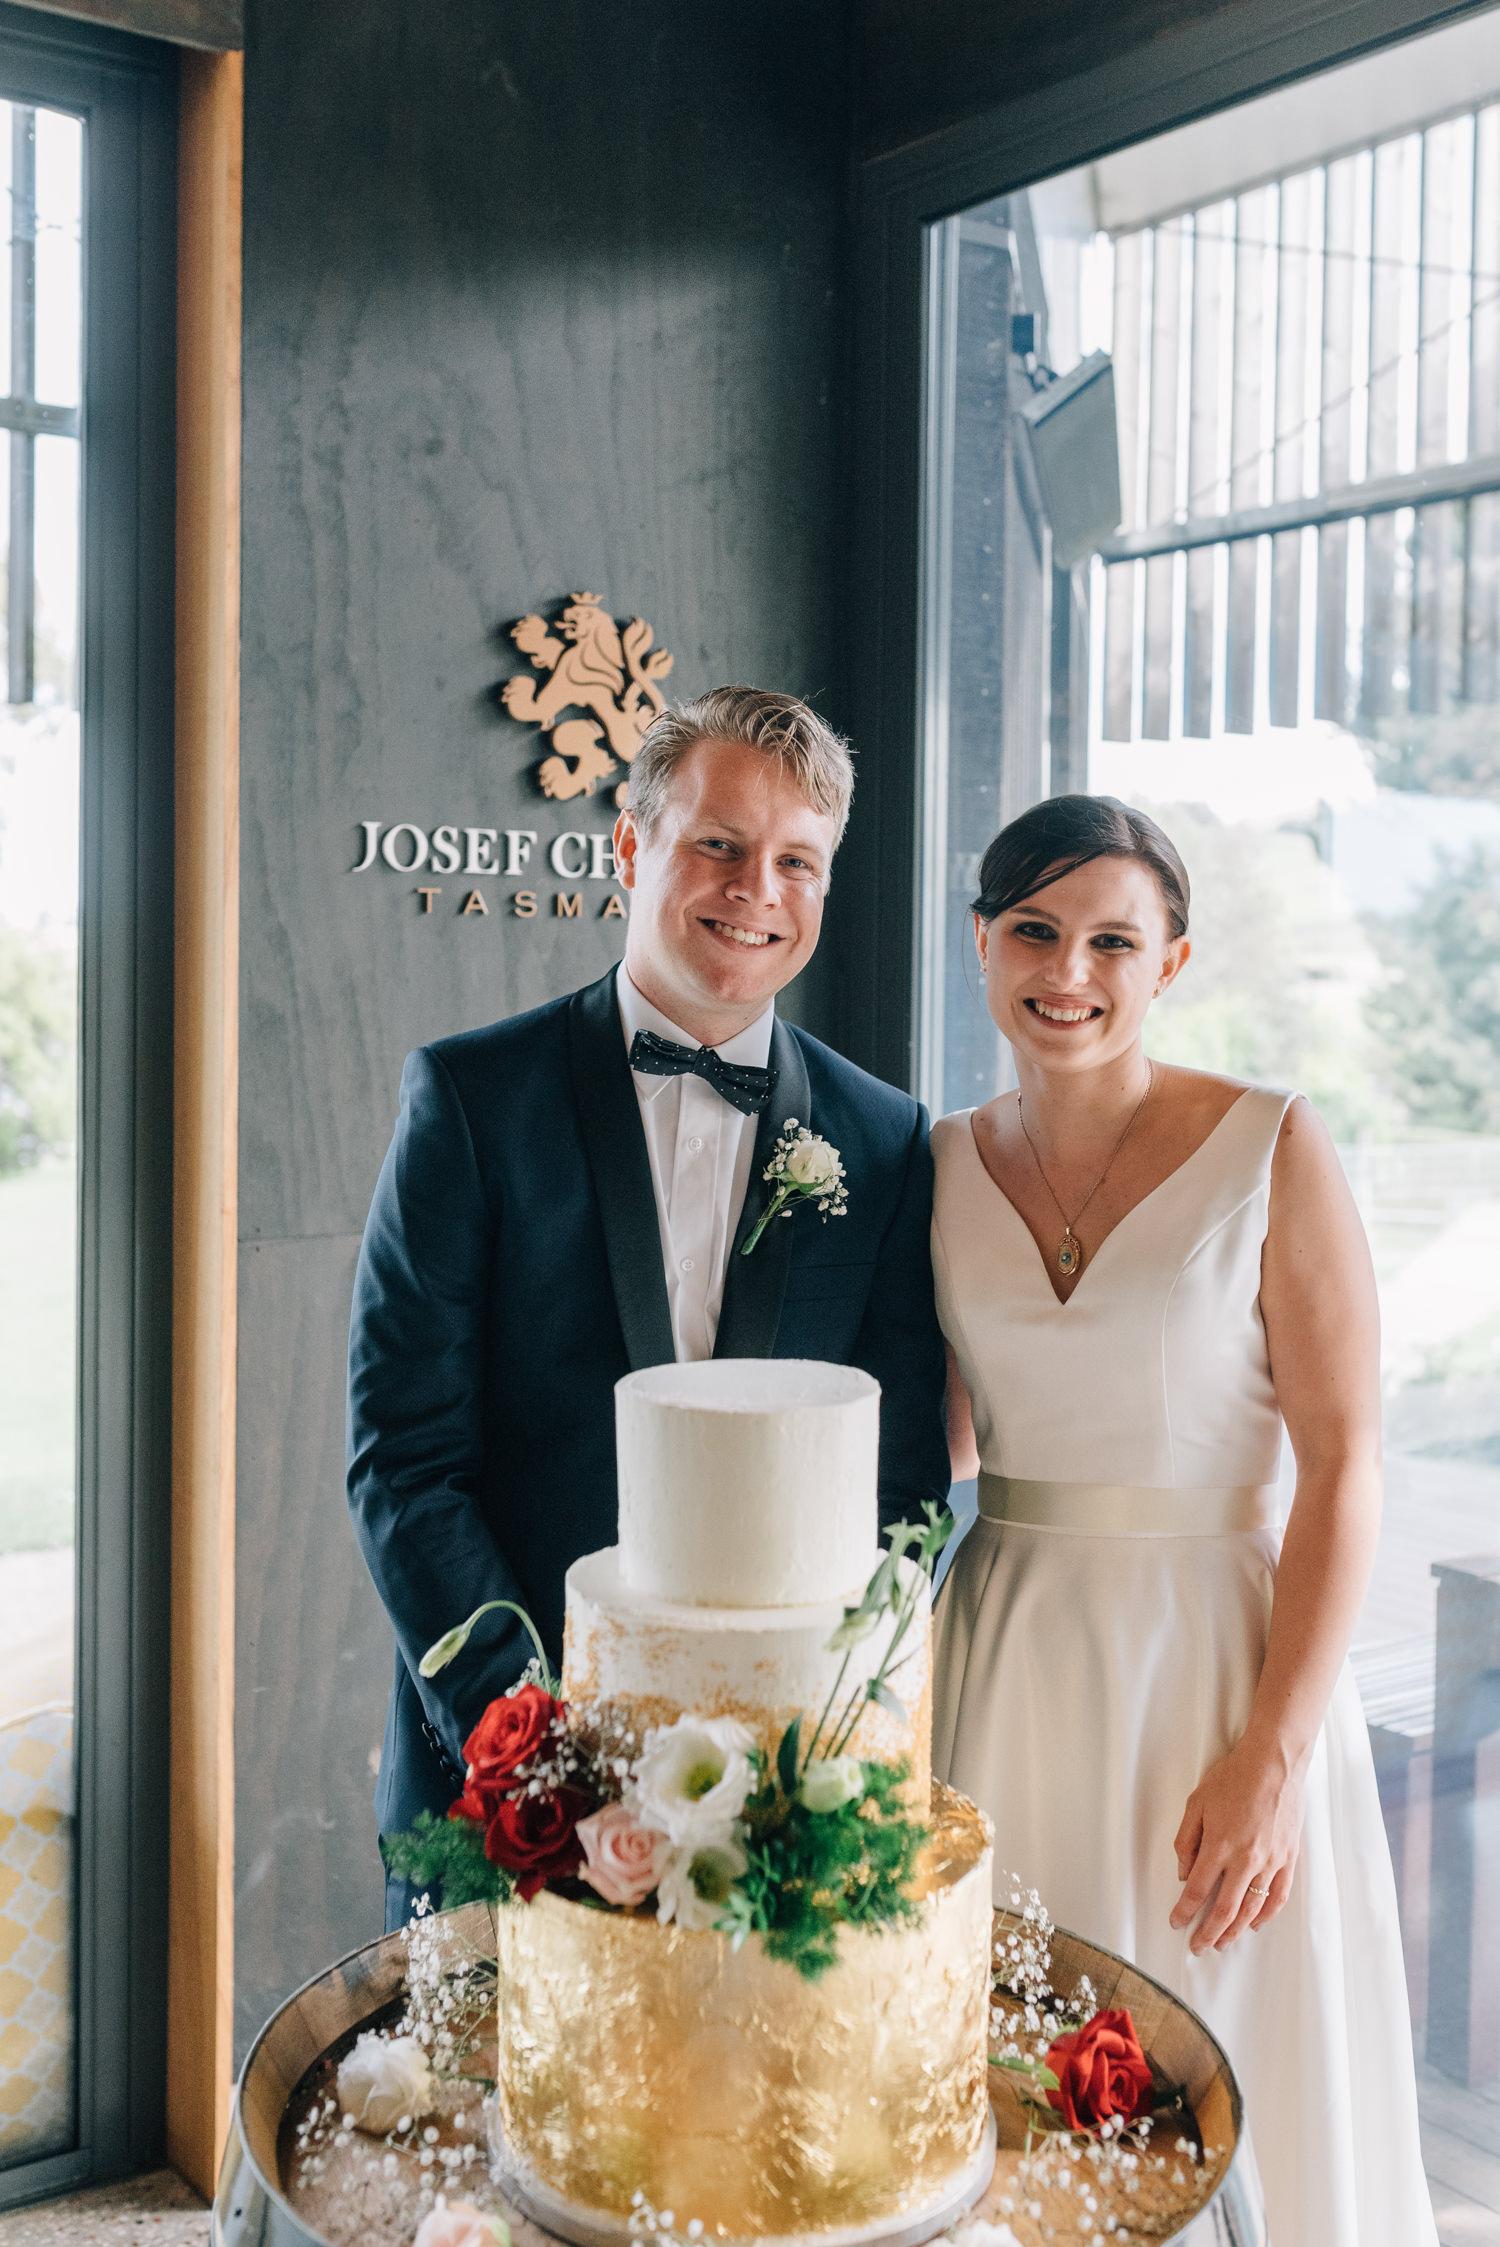 Josef-Chromy-Wedding-Photographer-86.jpg